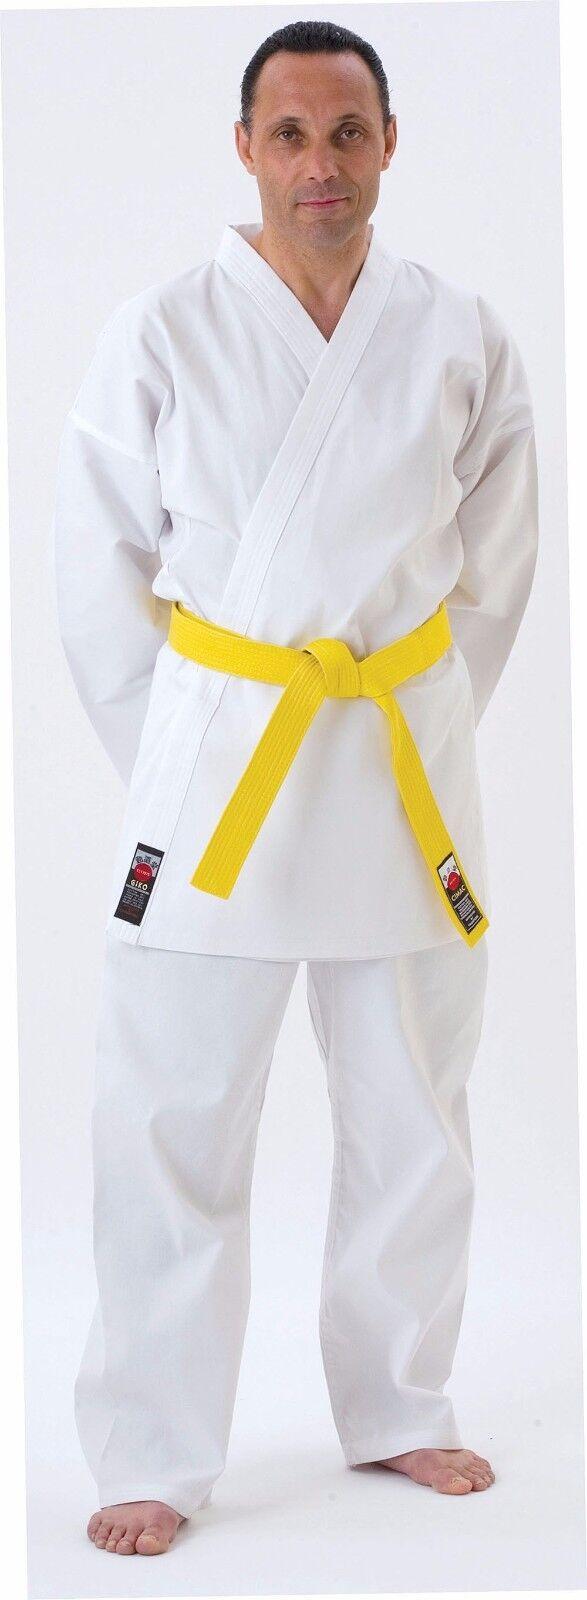 Enfants Blanc Kimono de Karaté Gi Uniforme Ceinture Ceinture Ceinture Gratuite 110 -150cm aaf991